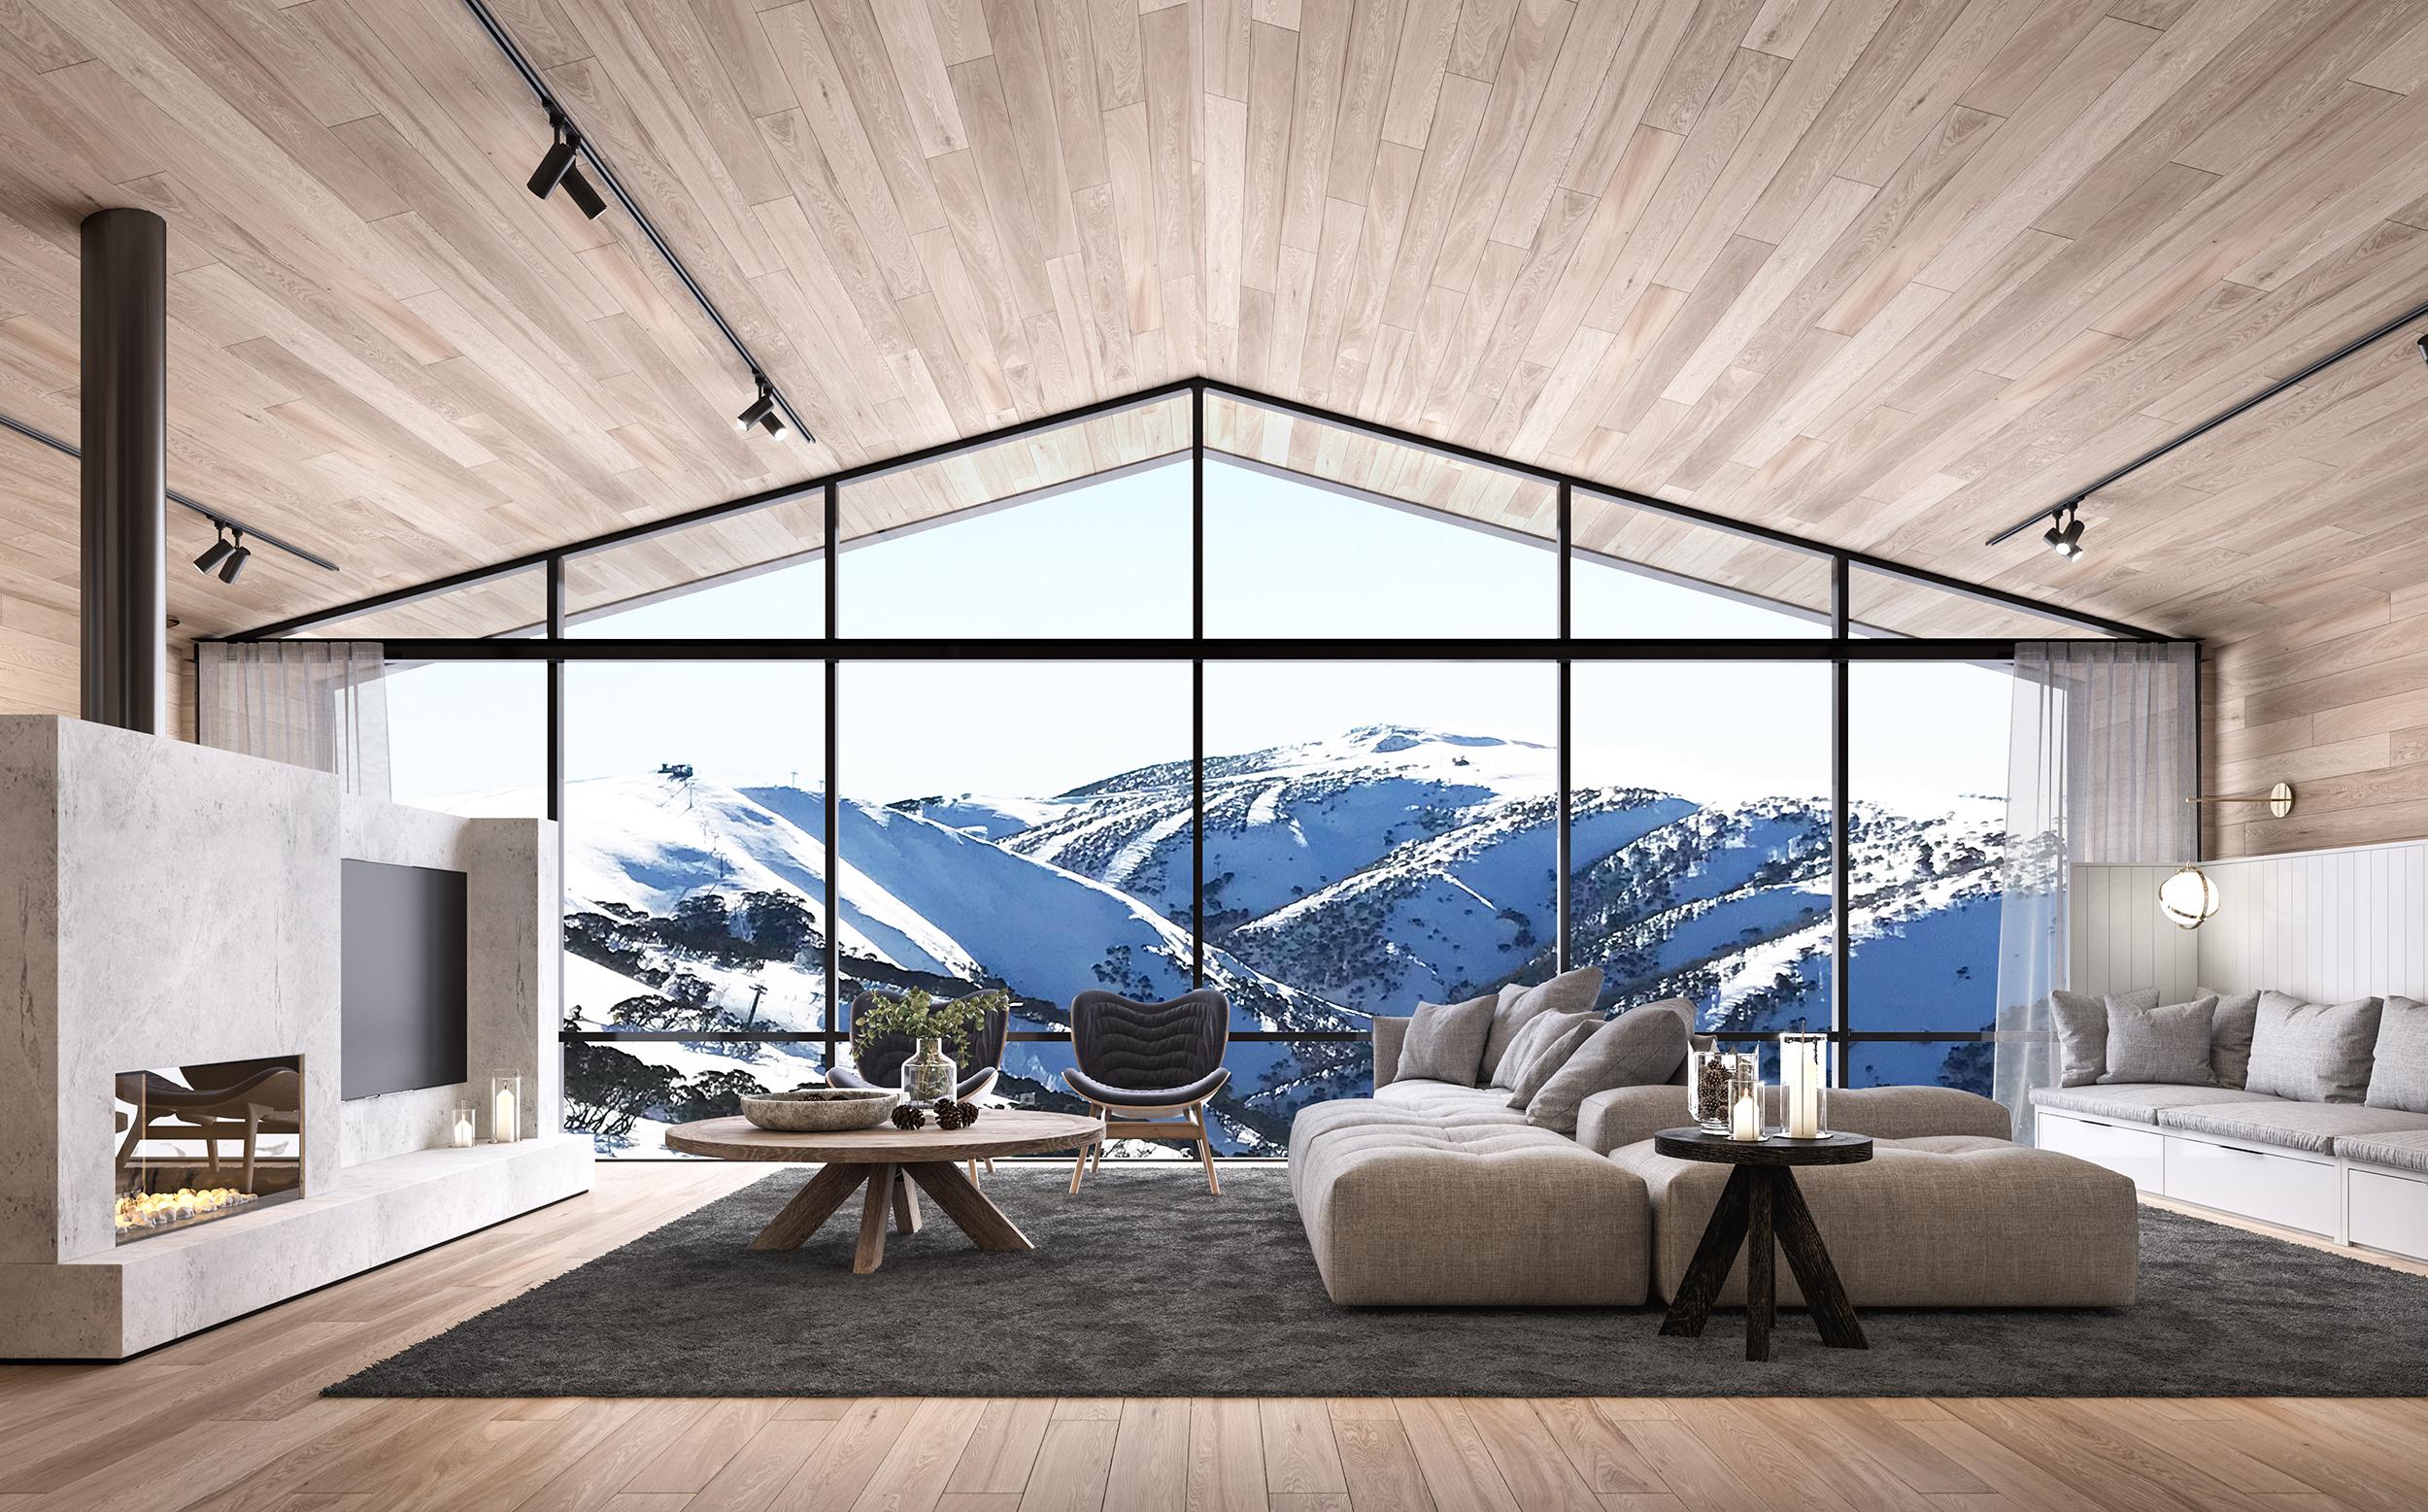 HOTHAM HOUSE : MOUNT HOTHAM - INTERIORS